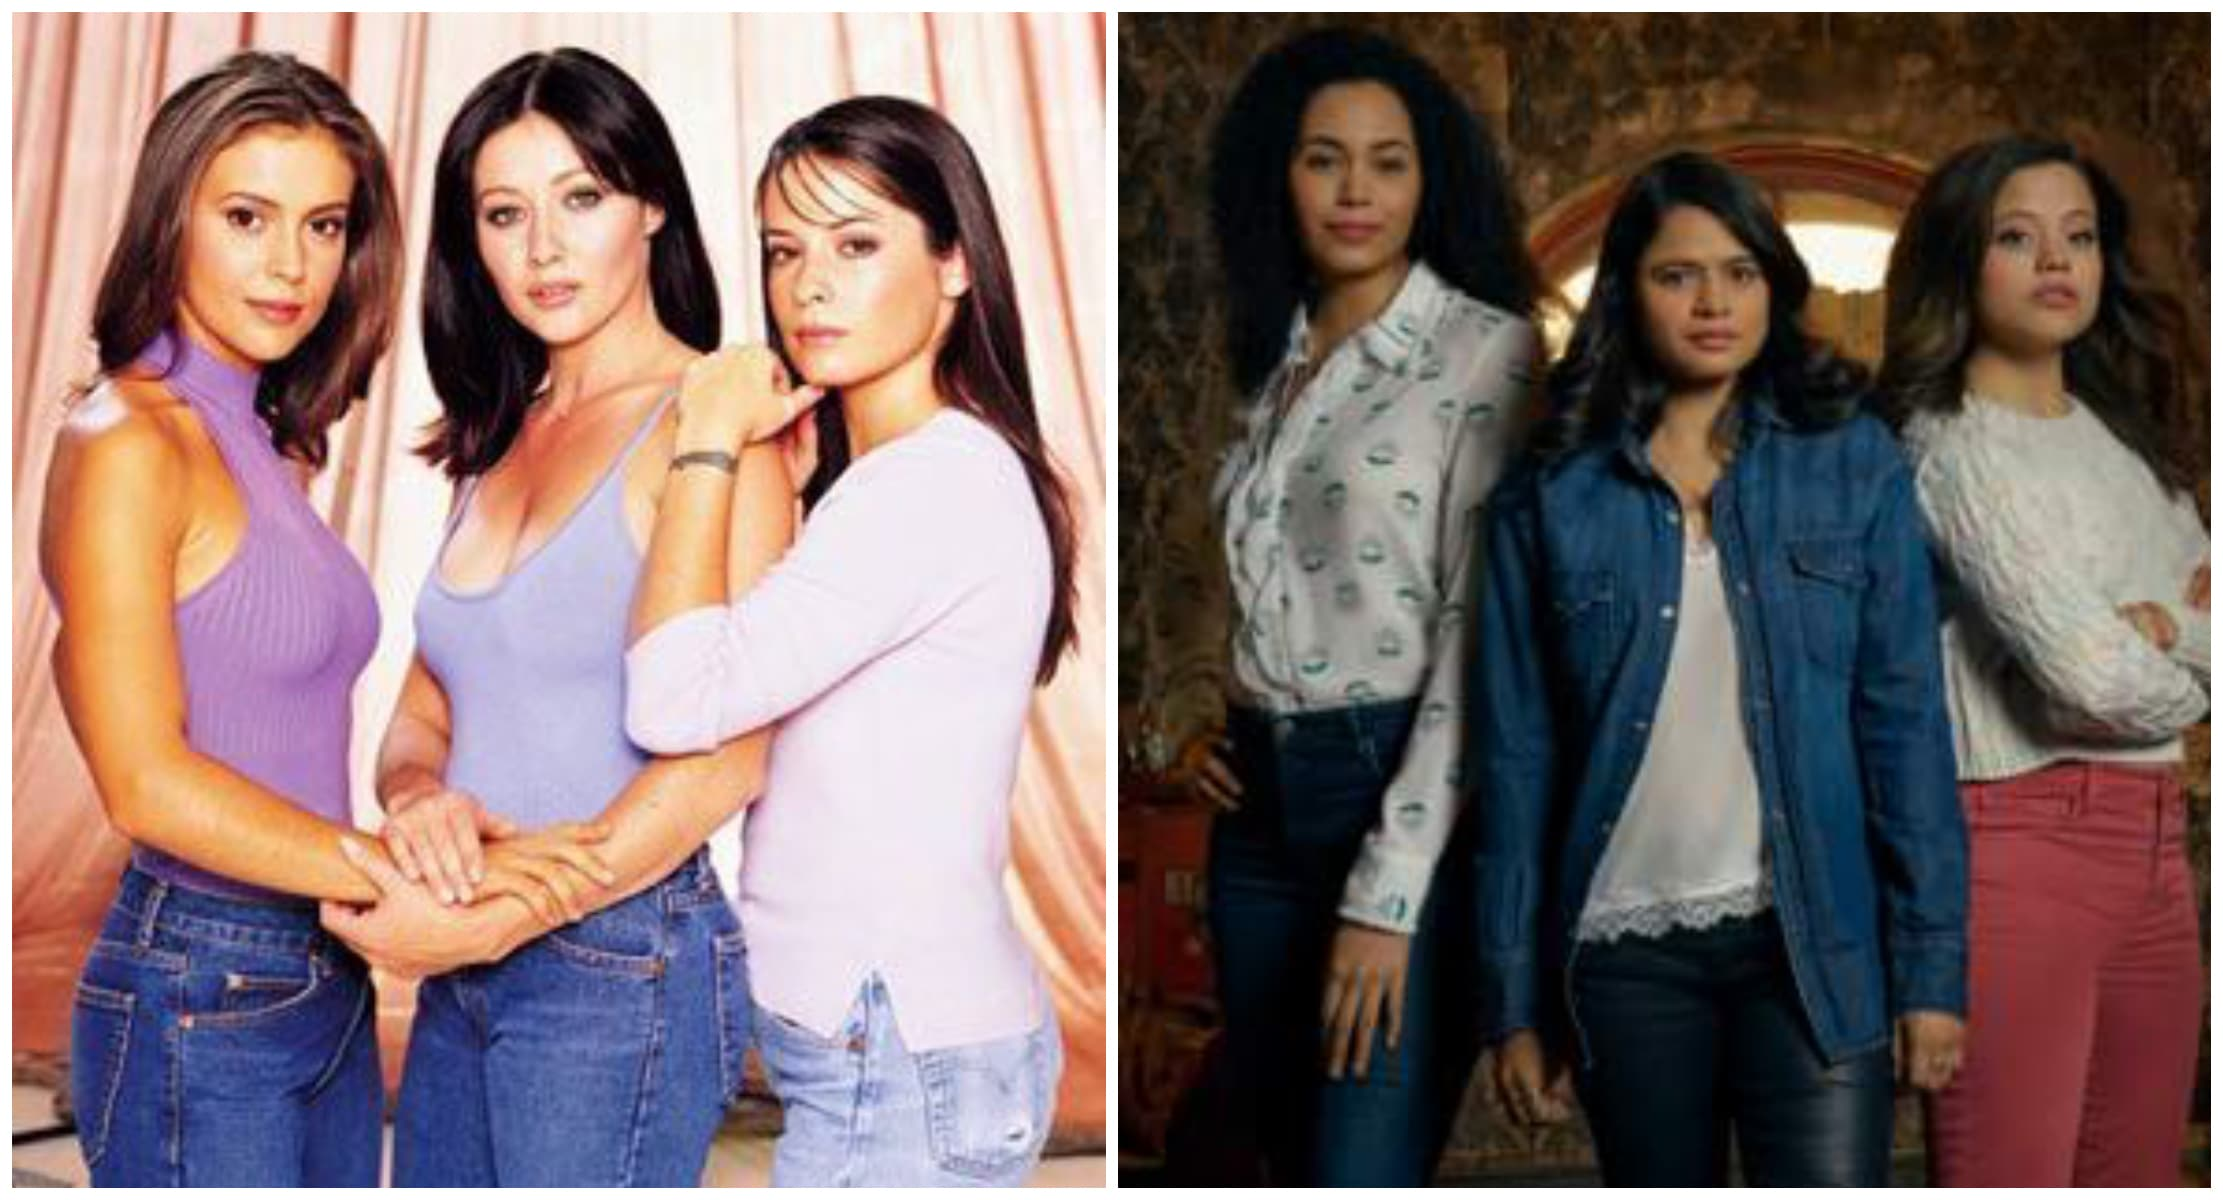 Charmed : M6 refuse de diffuser le reboot de la série